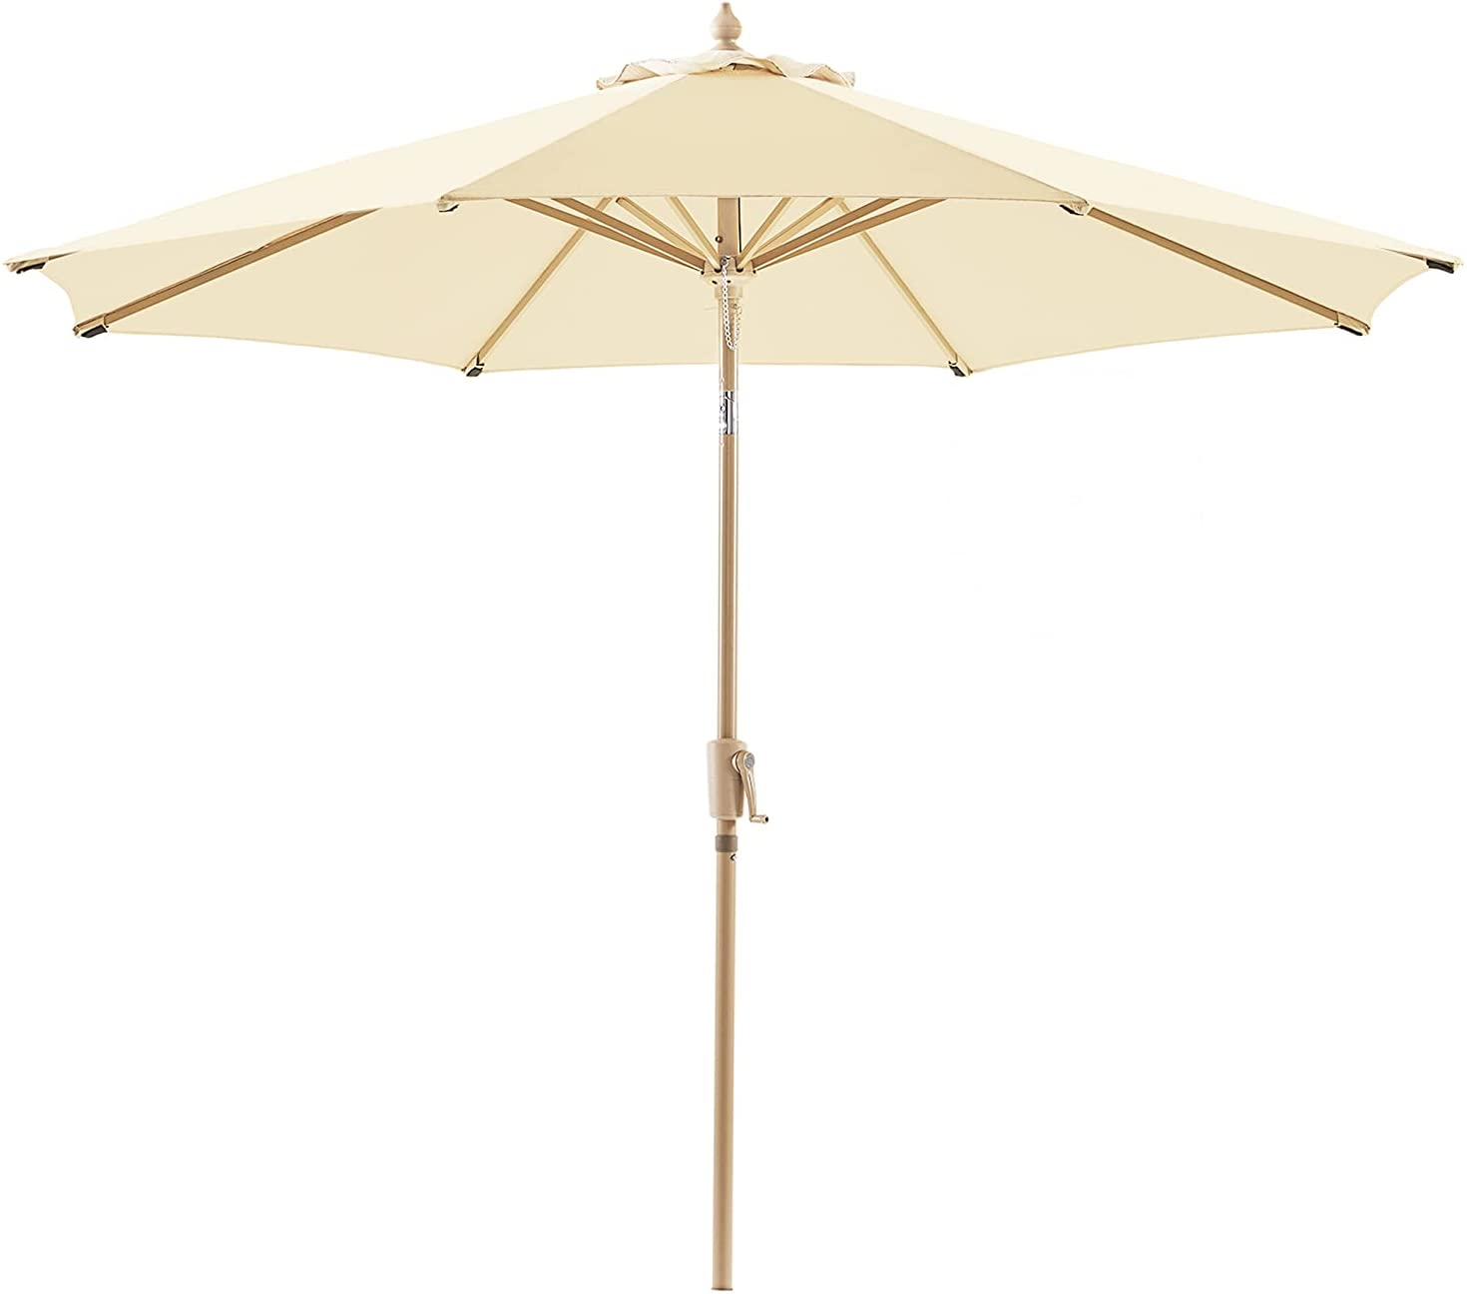 Le Conte Olefin 9 ft. Patio Umbrella Outdoor Market Umbrellas Table Umbrellas   3 Years Non-fading material & Push Button Tilt   Best for Deck, Balcony, Garden, Lawn & Pool (Beige)